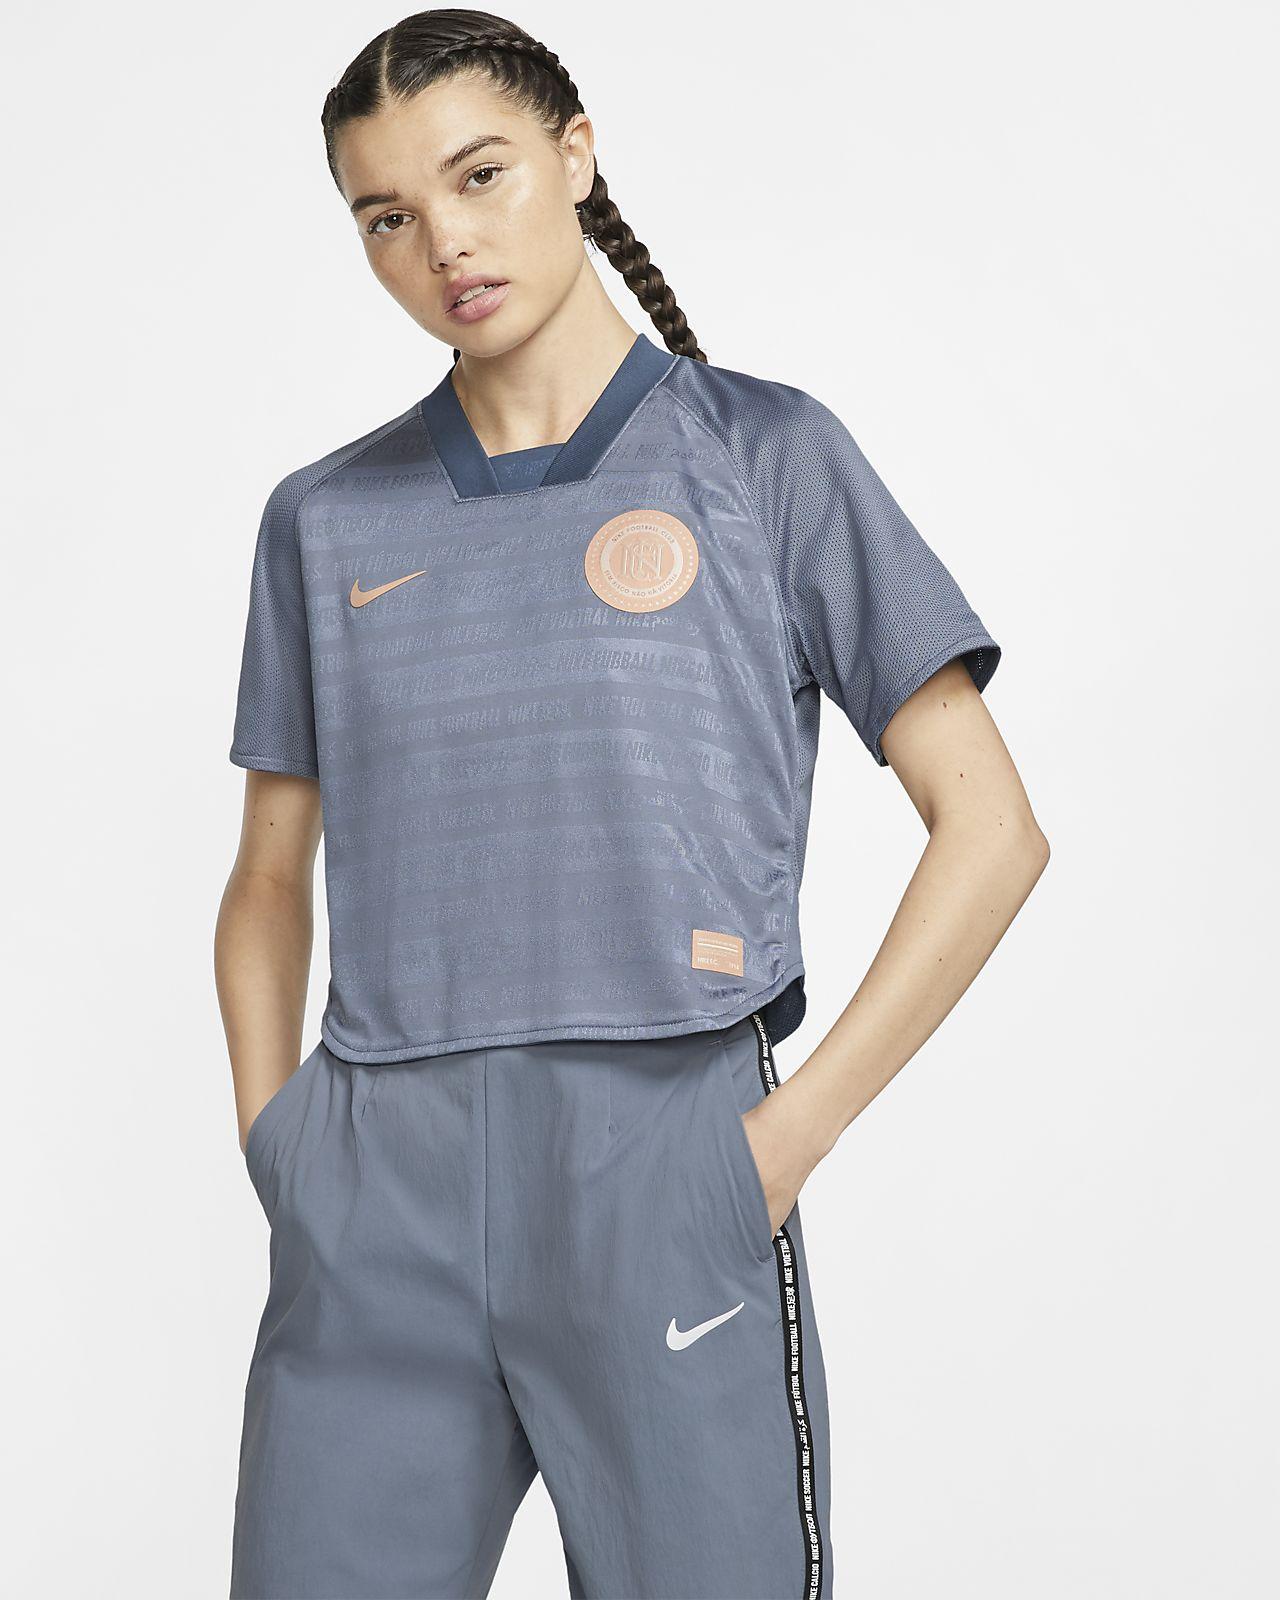 Nike F.C. Dri-FIT Kurzarm-Fußballoberteil für Damen